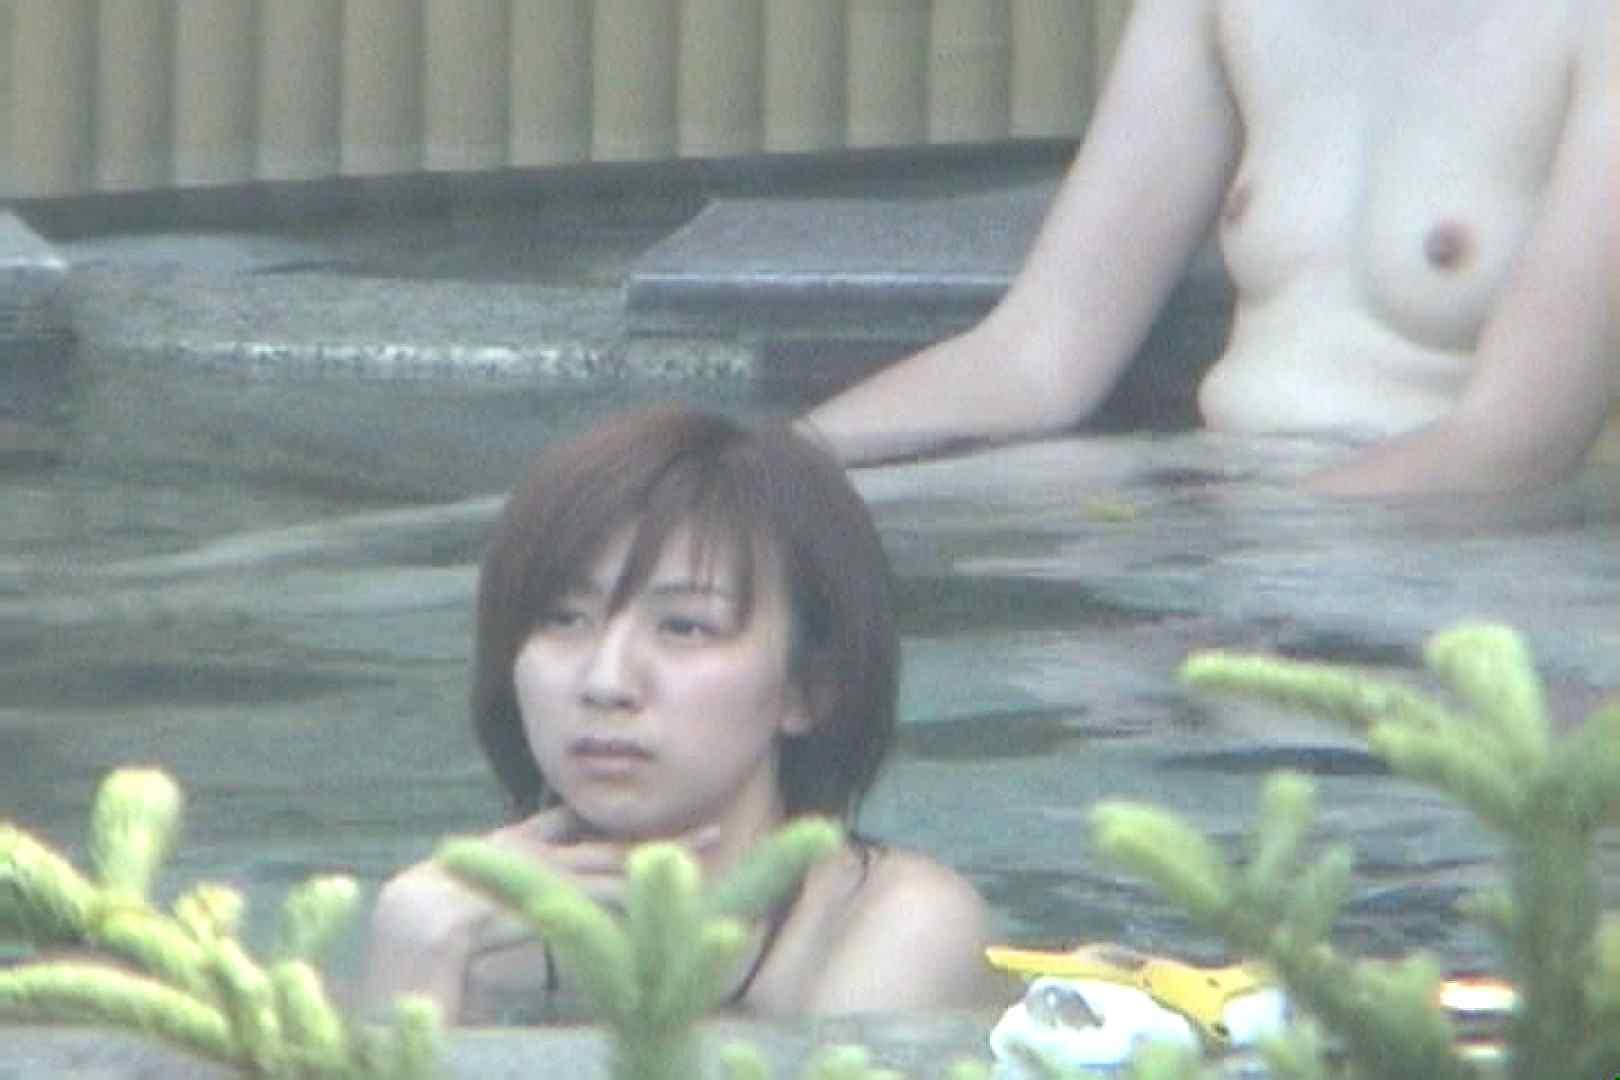 Aquaな露天風呂Vol.77【VIP限定】 露天   盗撮特集  98画像 8